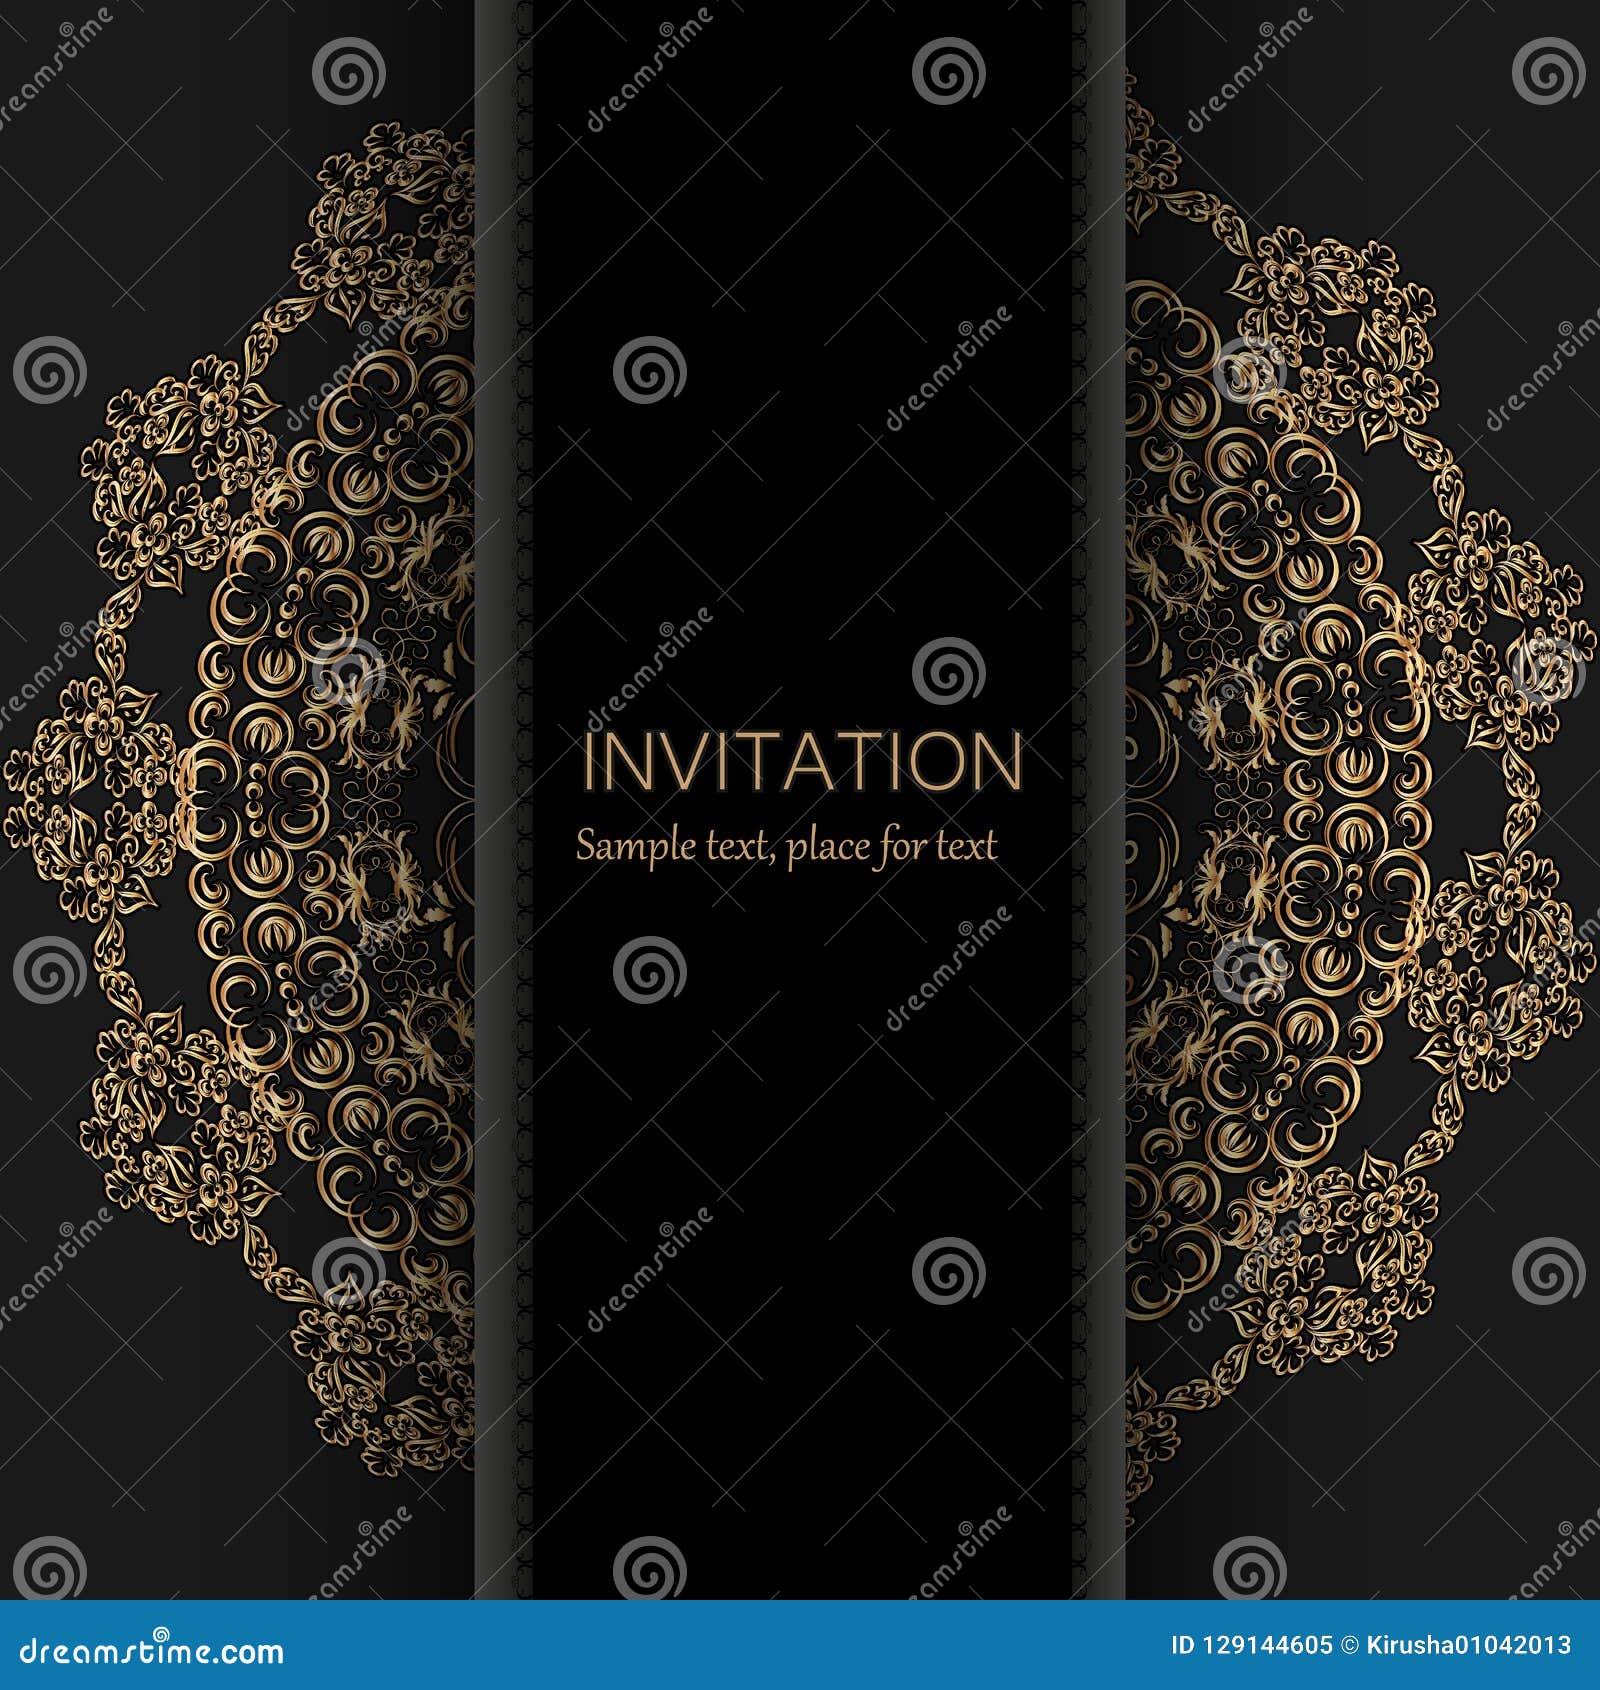 Invitation Template. Modern Design. Wedding Invitation Or Card ...